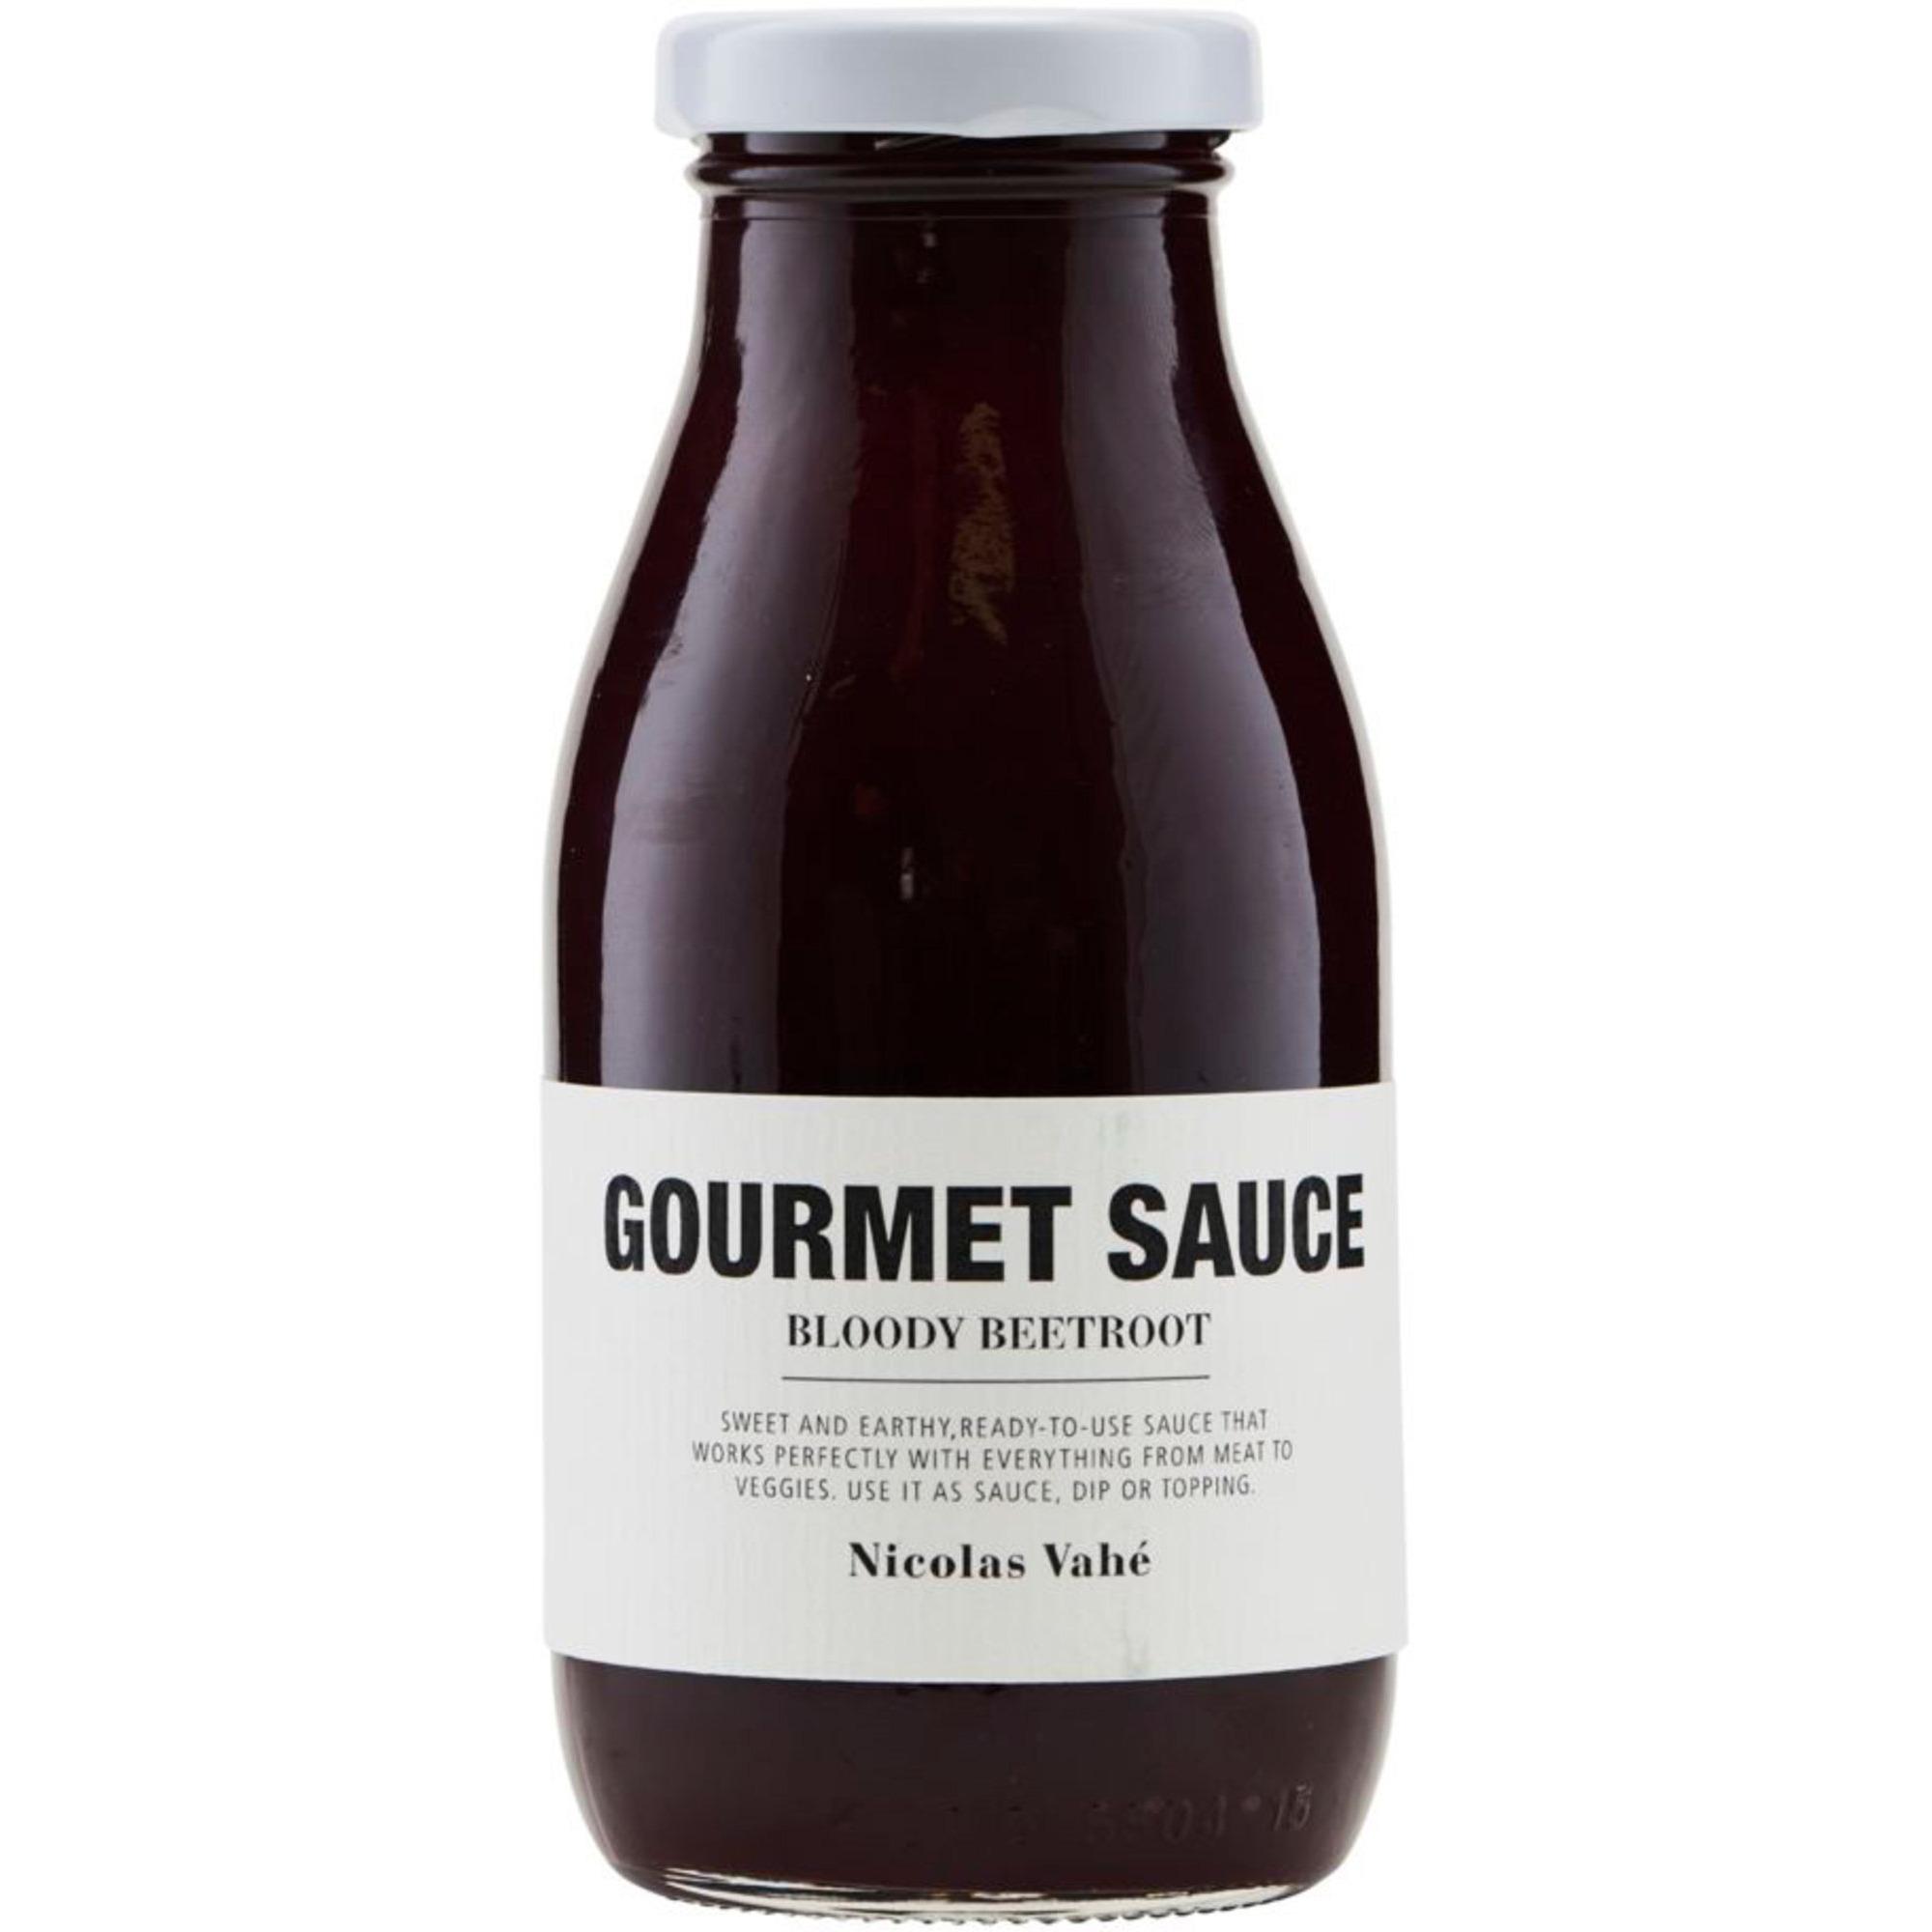 Nicolas Vahé Bloody Beetroot gourmet sauce